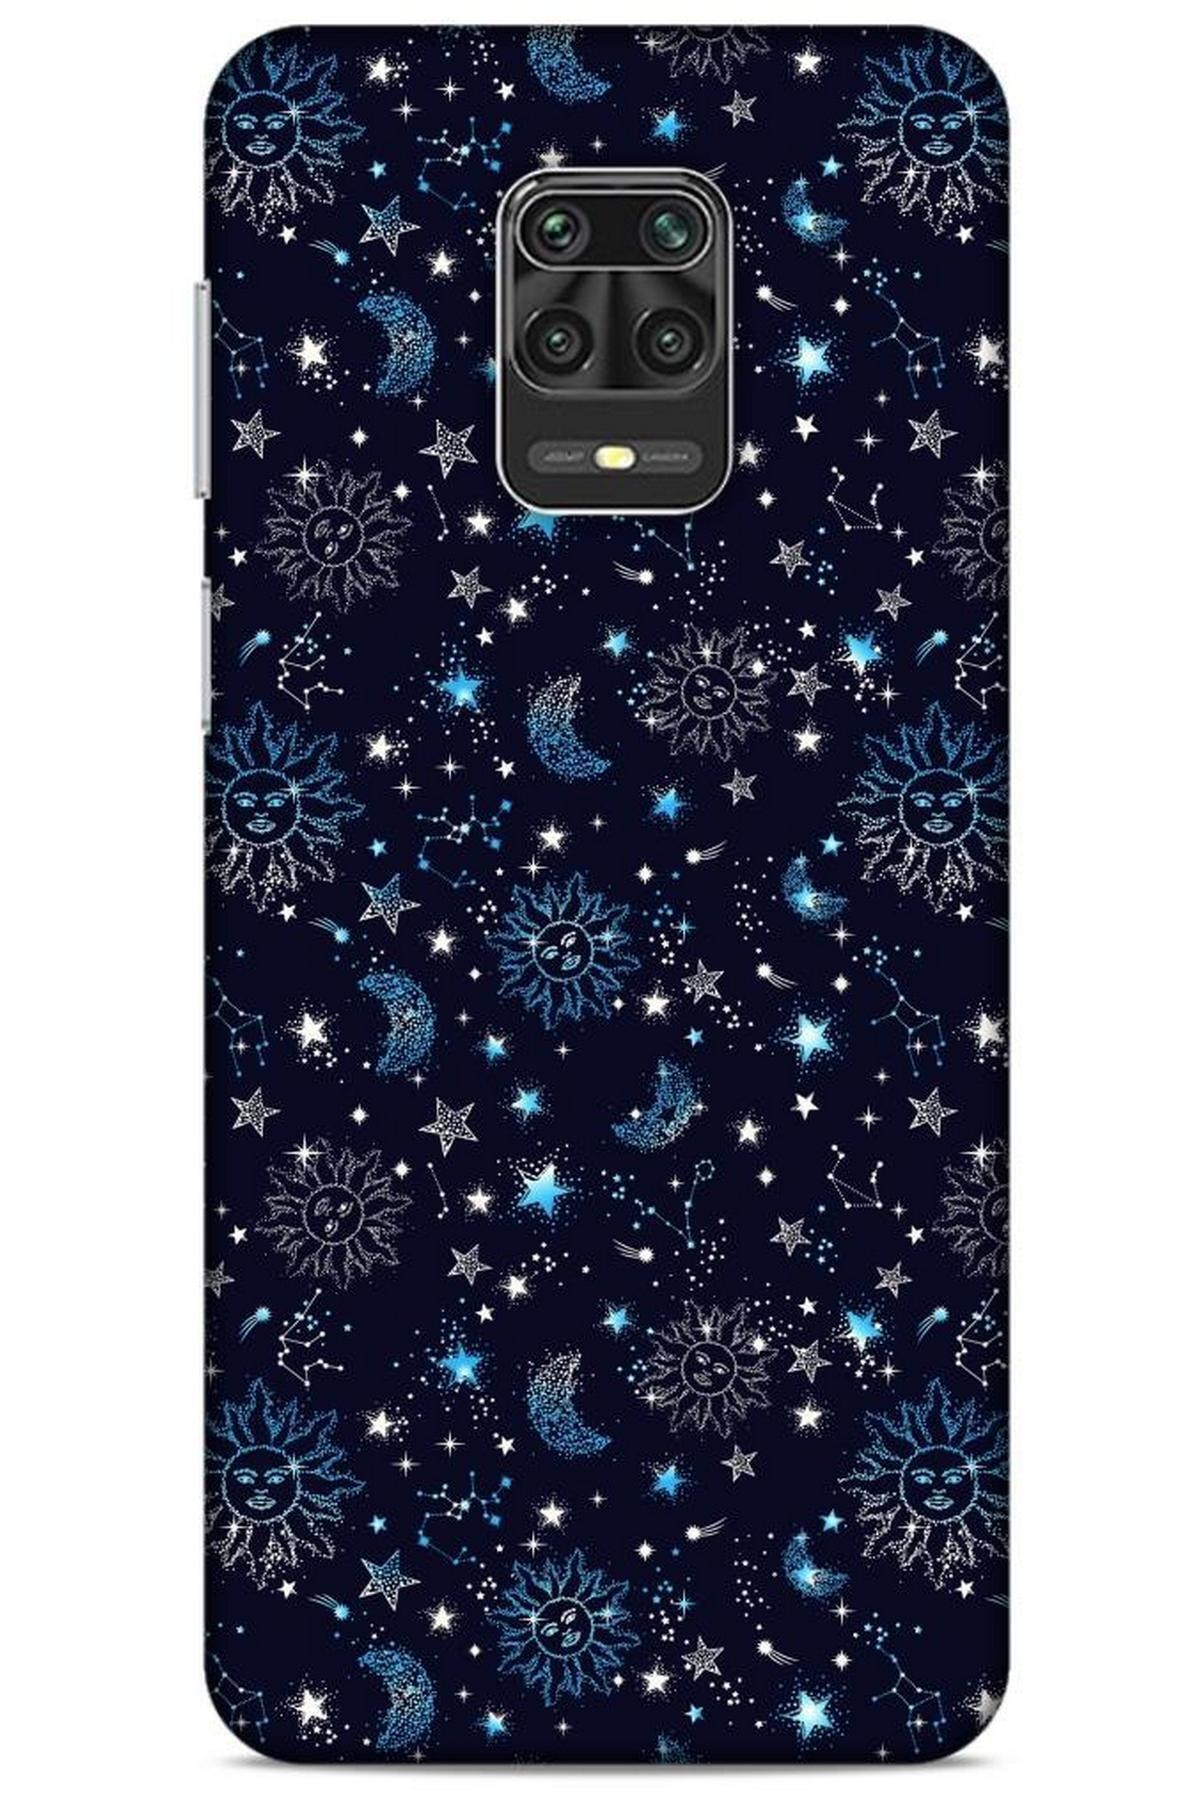 Lopard Spacex (9) Tema Kılıf Xiaomi Redmi Note 9s Kılıf 1